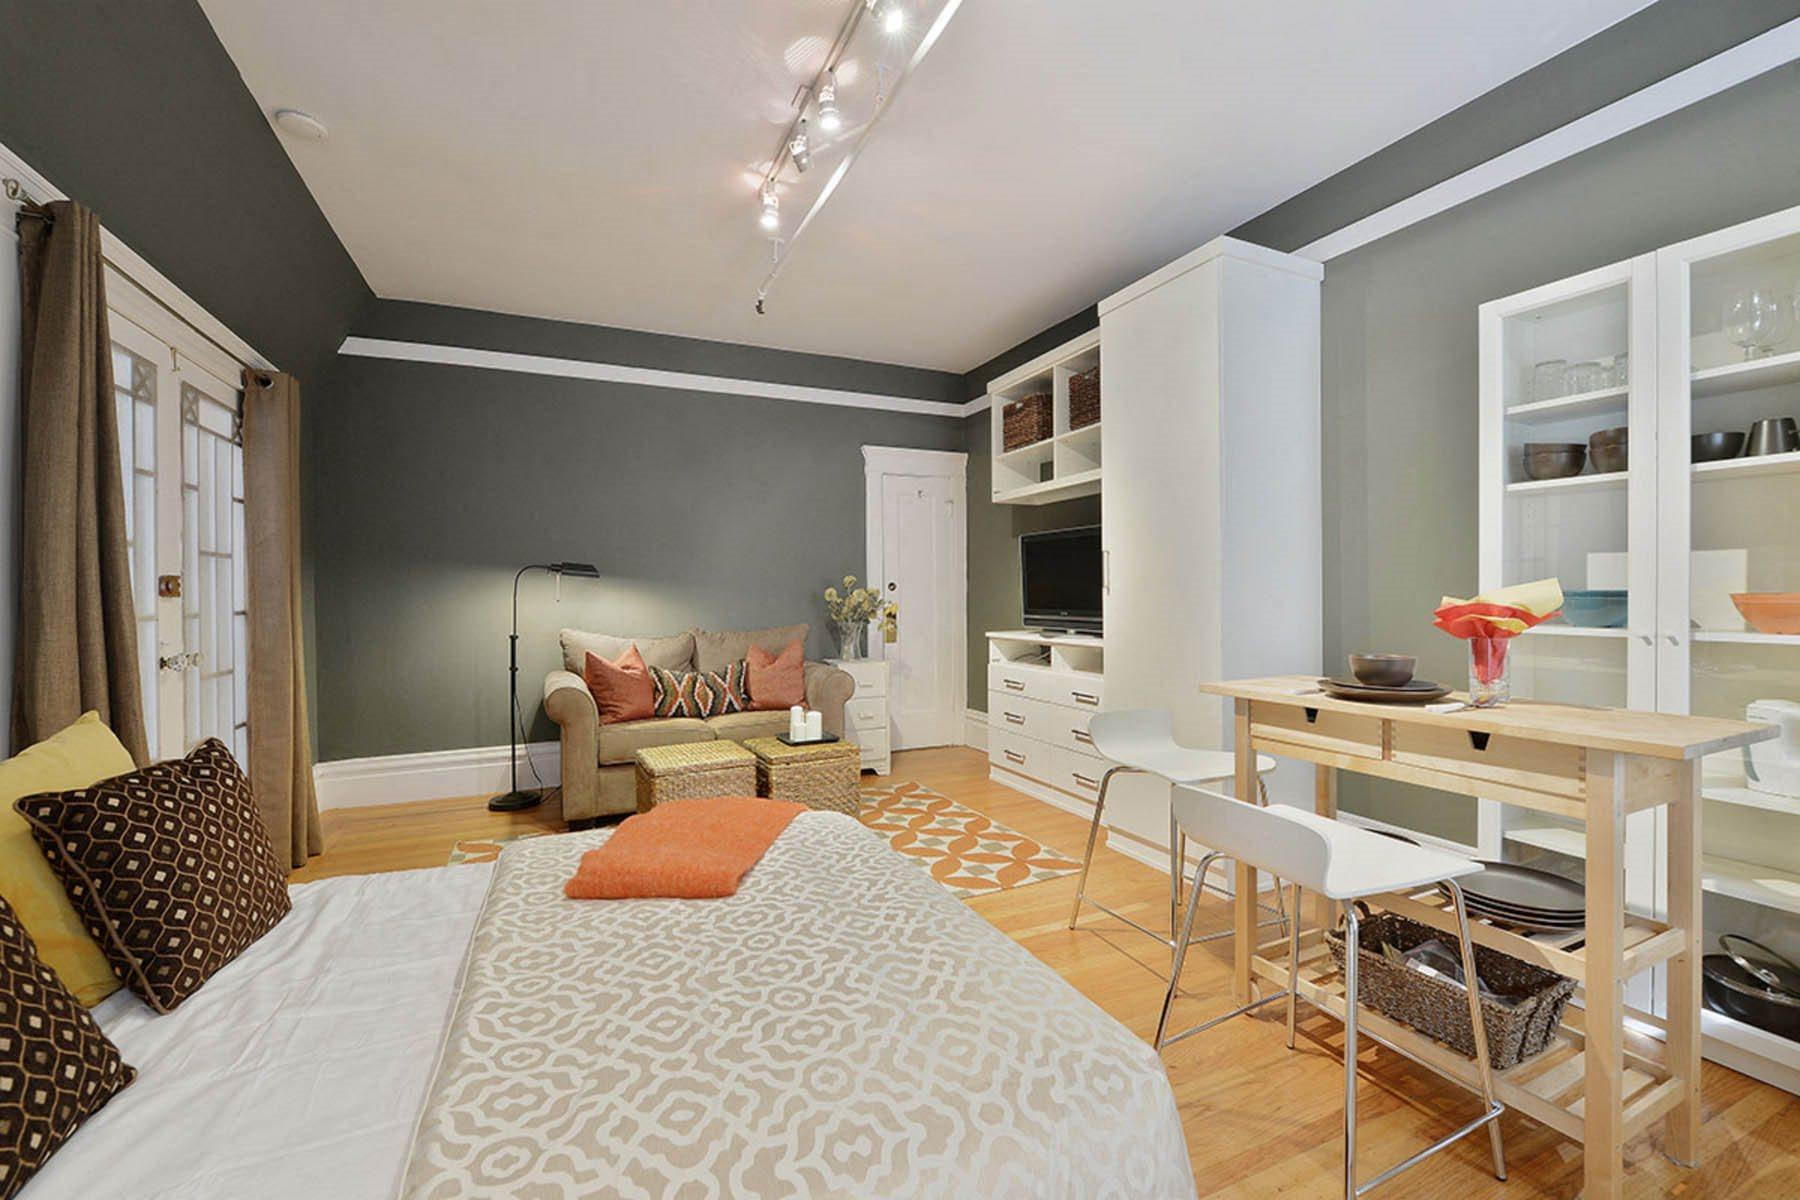 2730 SACRAMENTO Apartments homepagegallery 6